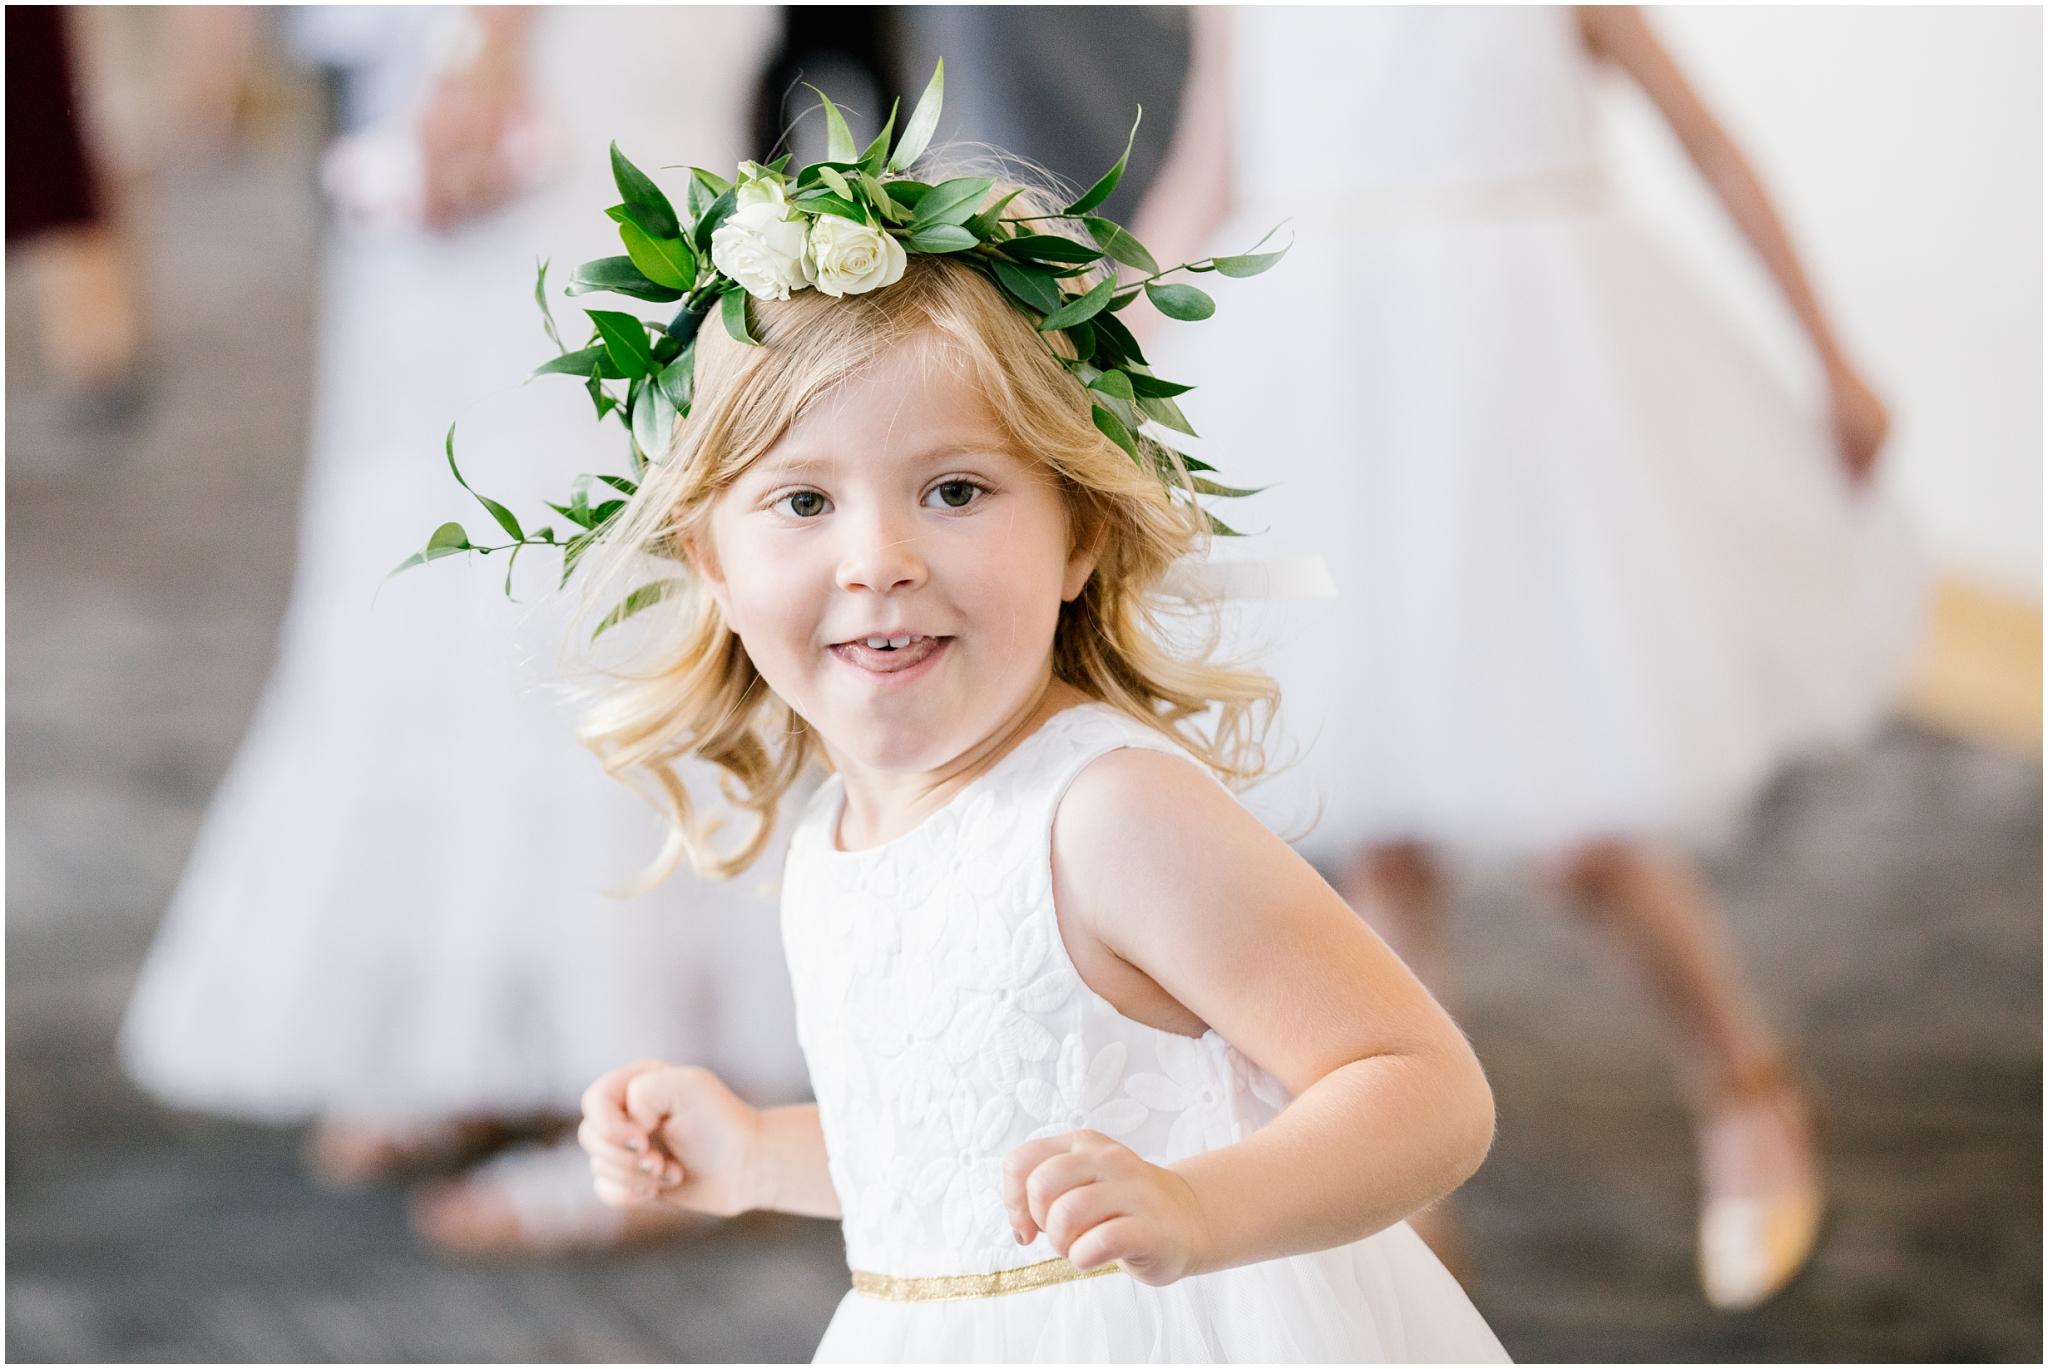 CherylandTyler-448_Lizzie-B-Imagery-Utah-Wedding-Photographer-Salt-Lake-City-Temple-Wells-Fargo-Building-Reception.jpg